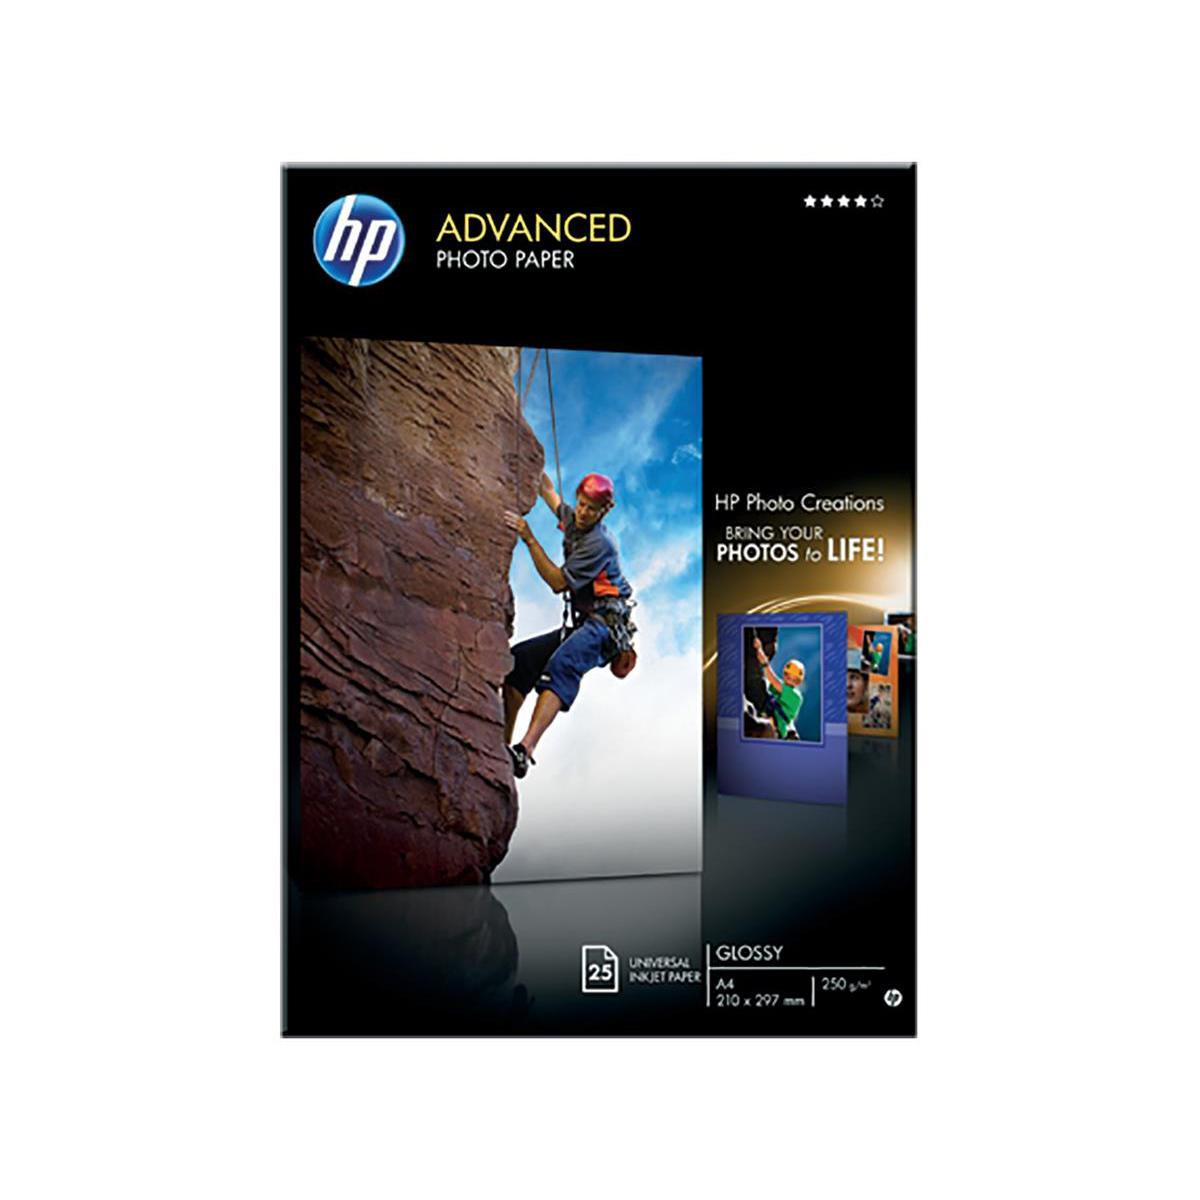 Hewlett Packard [HP} Advanced Photo Paper Glossy 250gsm A4 Ref Q5456A [25 Sheets]